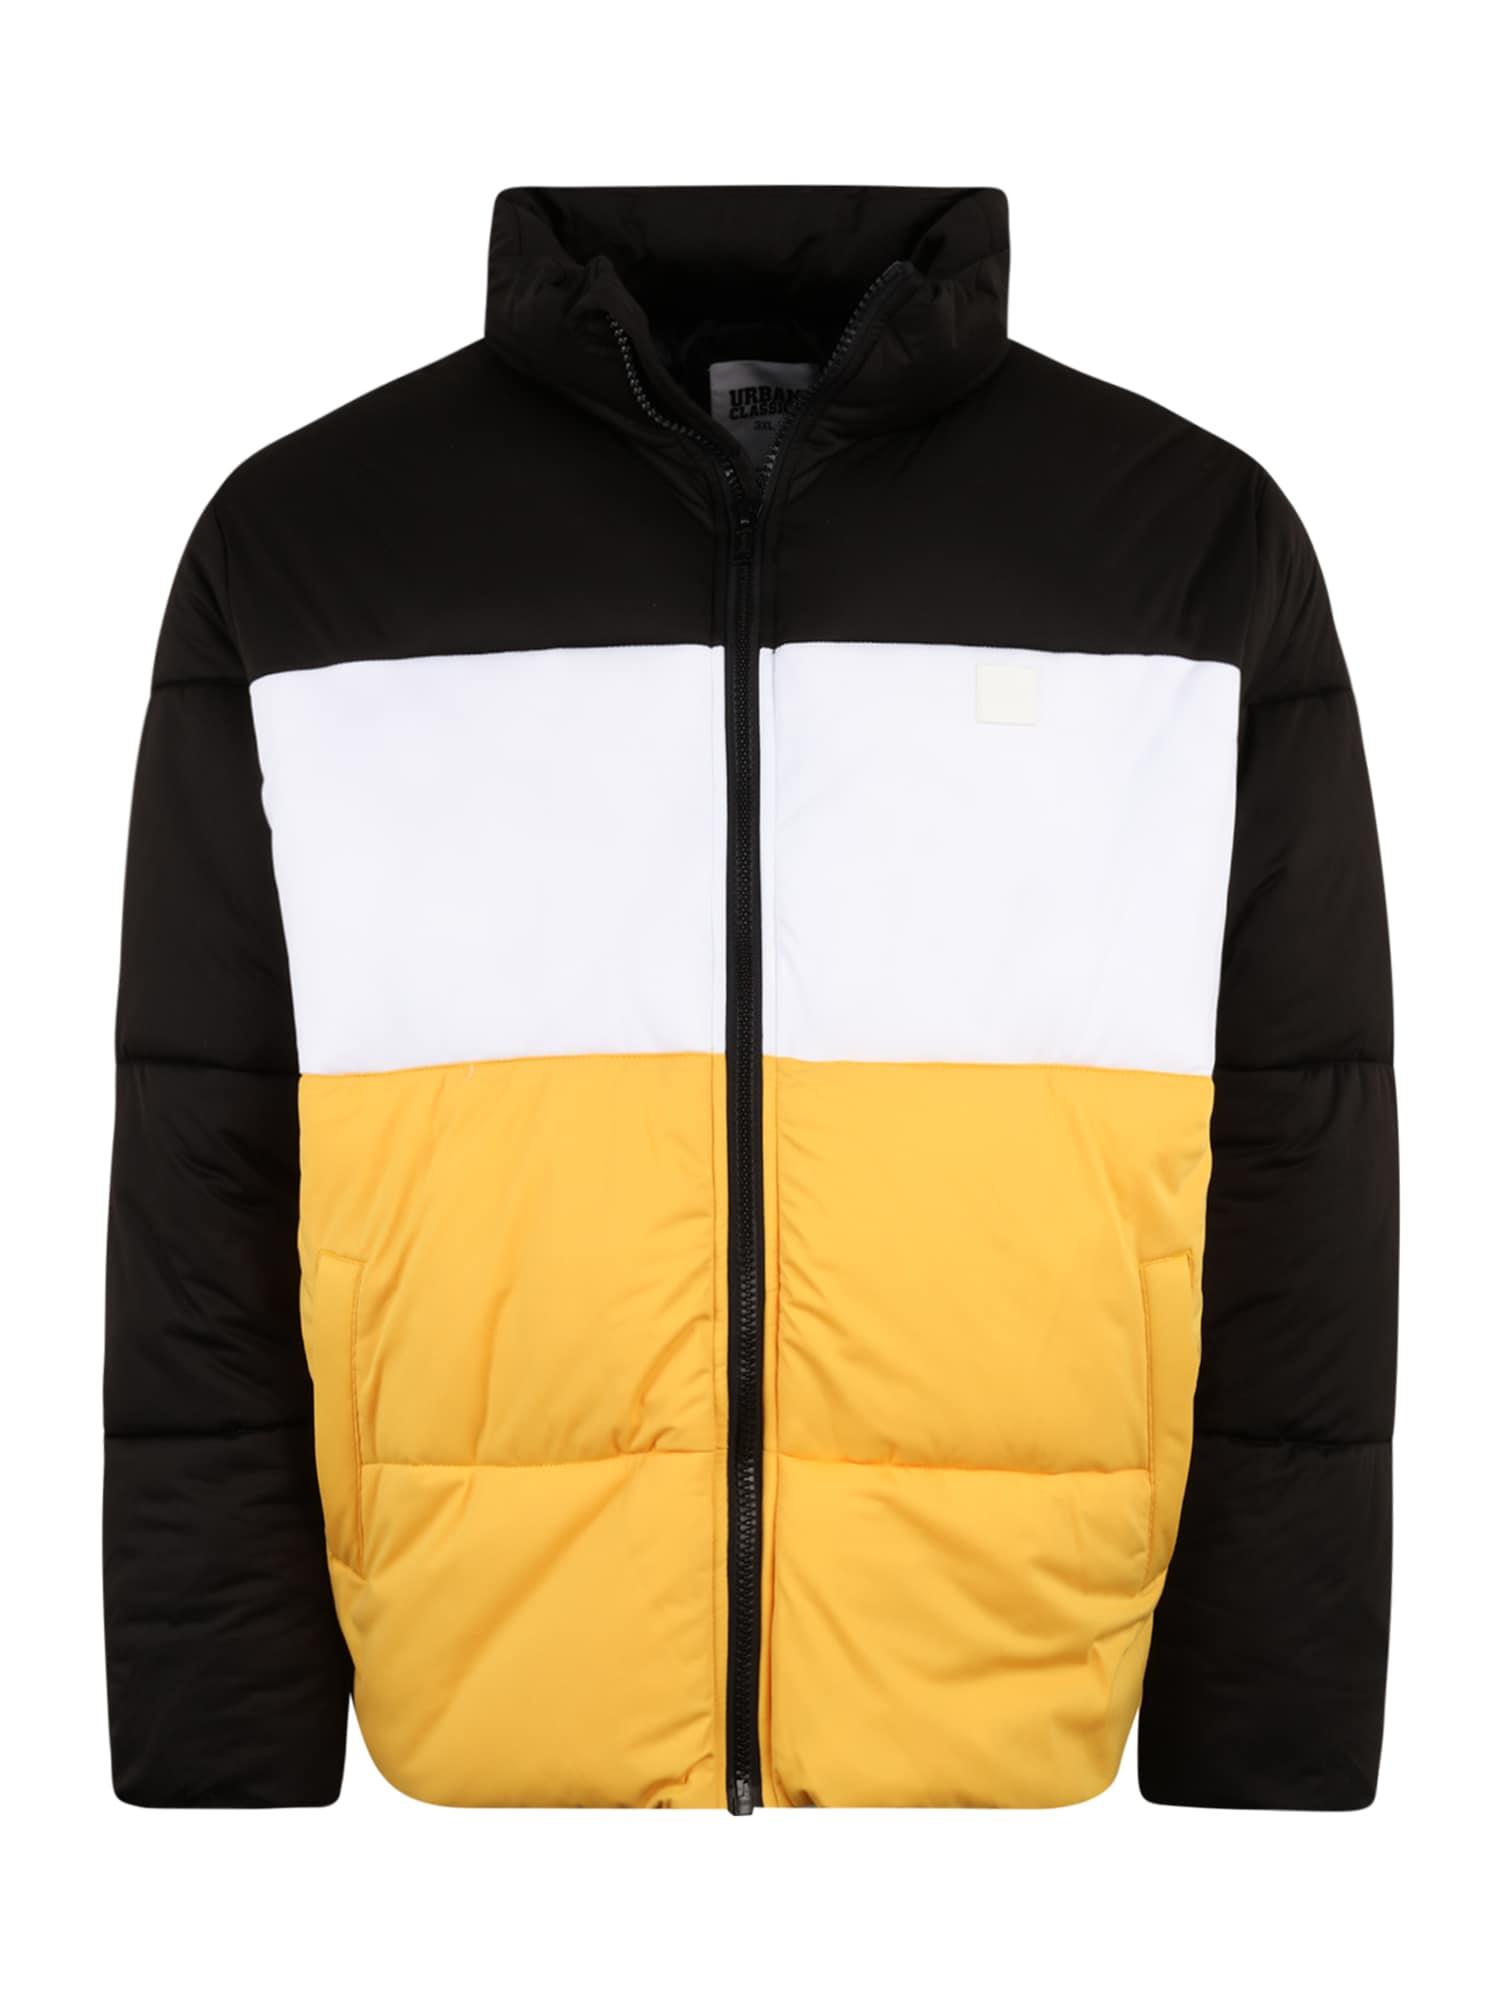 Urban Classics Big & Tall Demisezoninė striukė juoda / balta / geltona